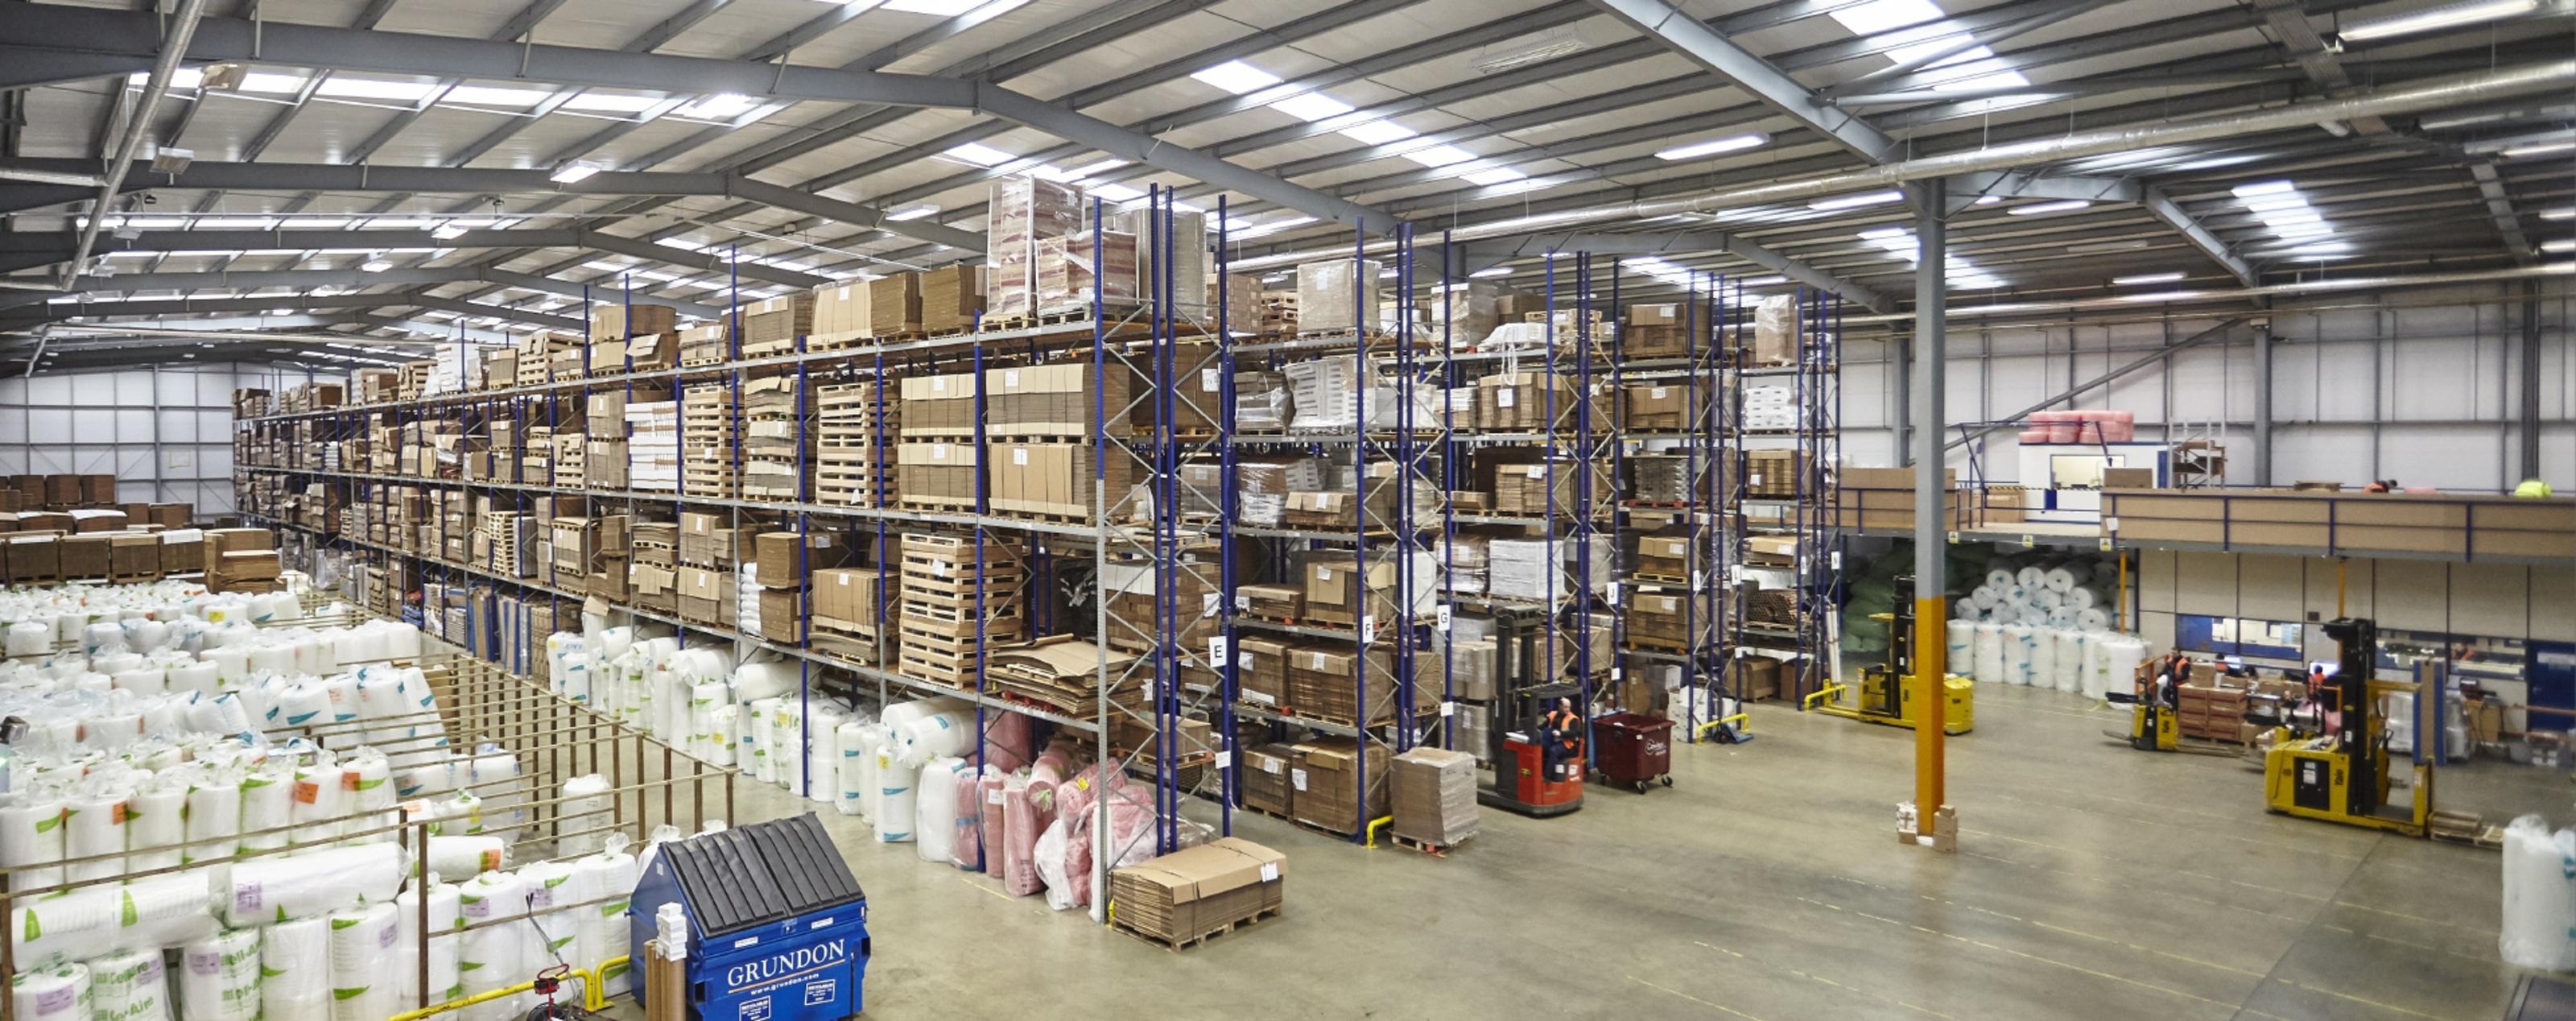 Macfarlane makes and supplies cardboard, plastic and bespoke packaging.